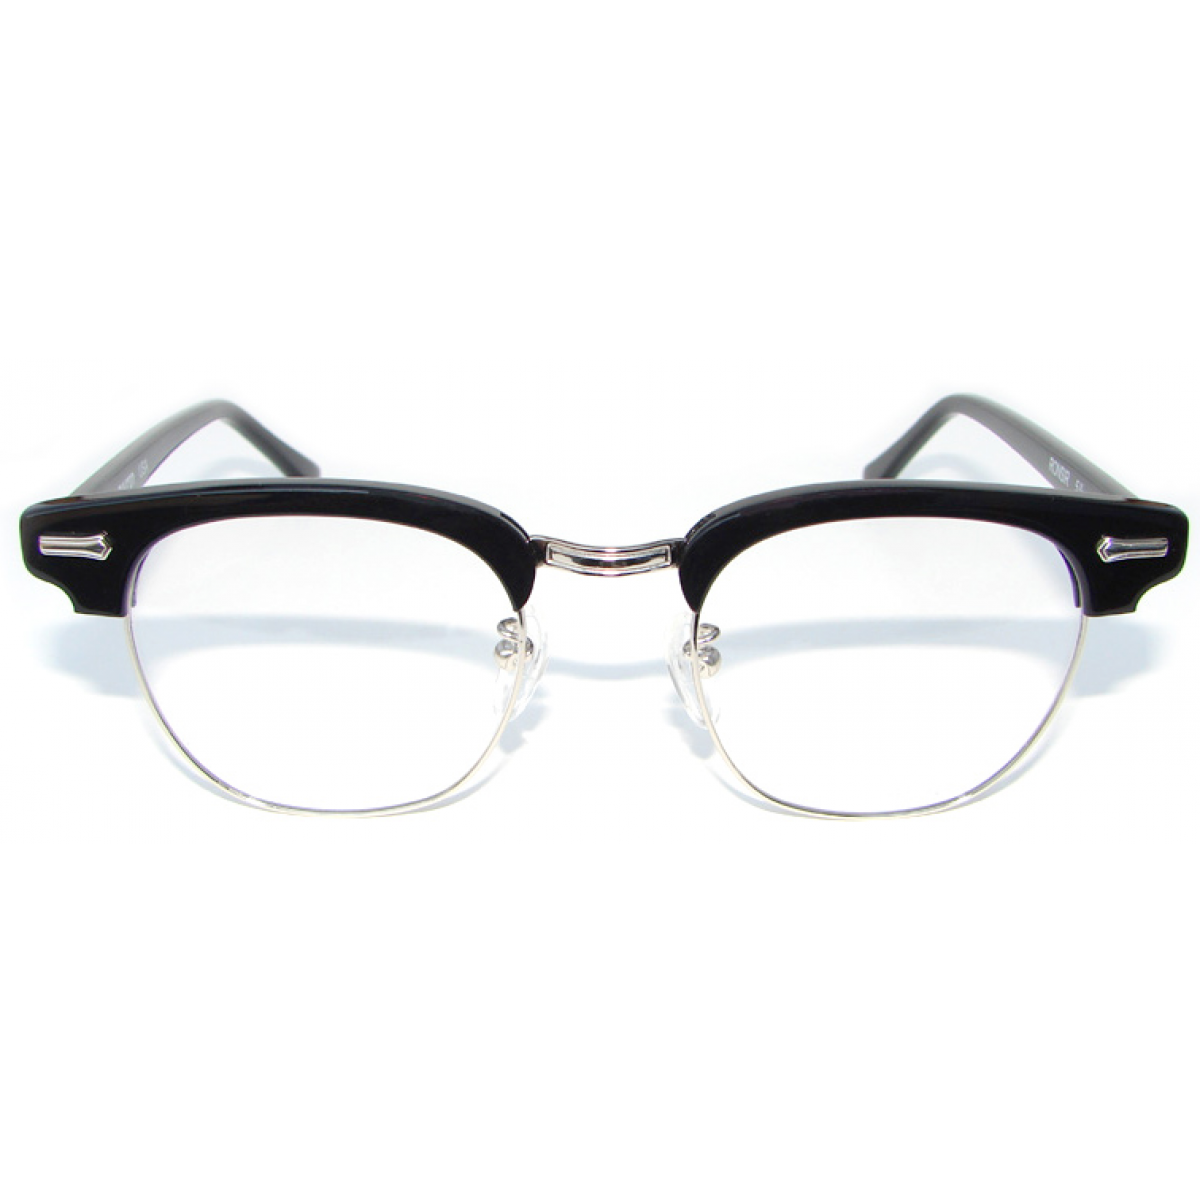 eyeglass.com-Ronsir Classic Clubmaster Eyeglasses-34 #SUNBANS ...